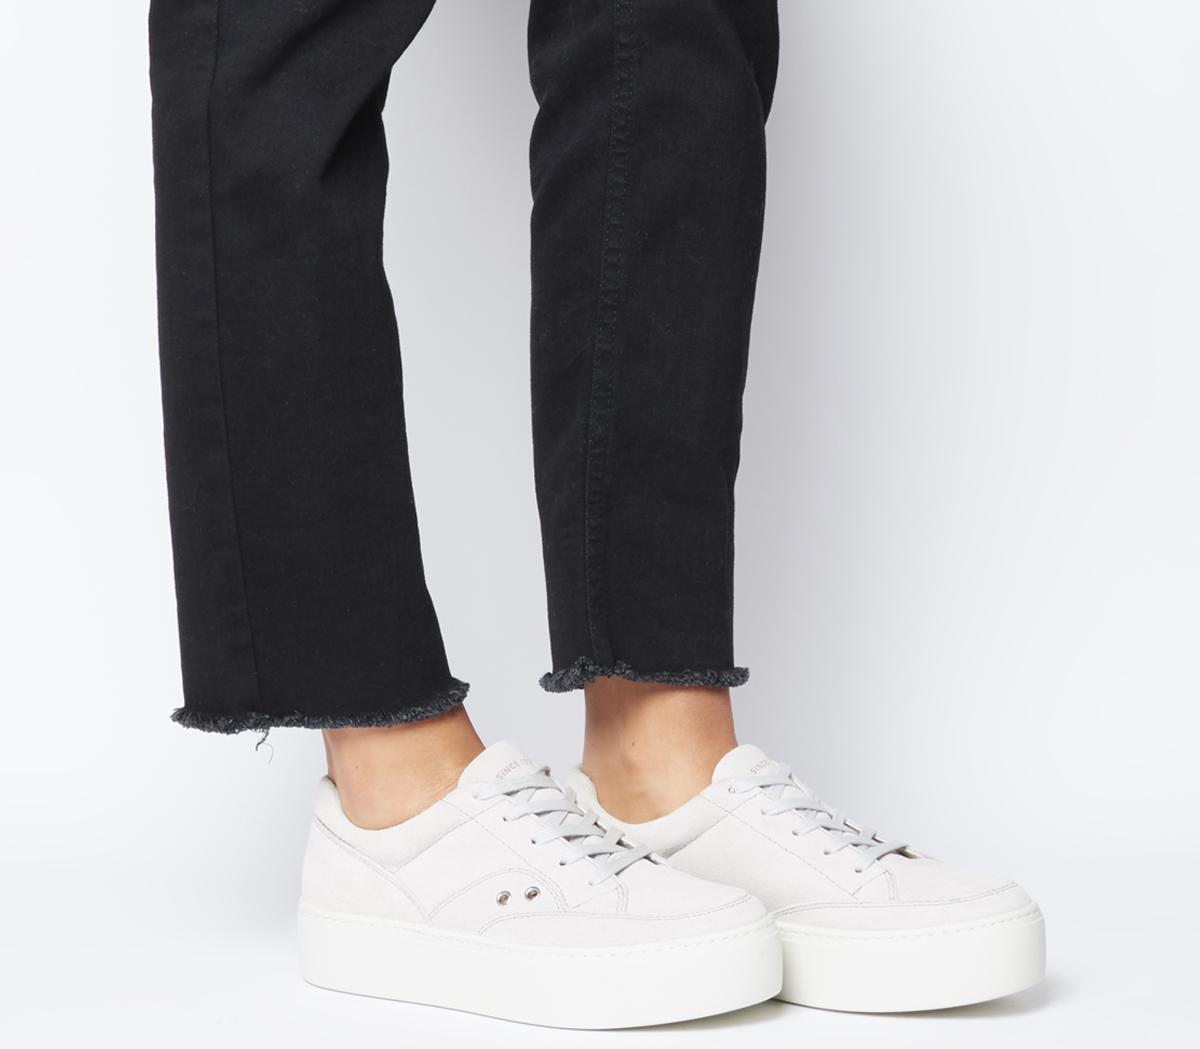 Vagabond Jessie Sneakers Salt - Hers